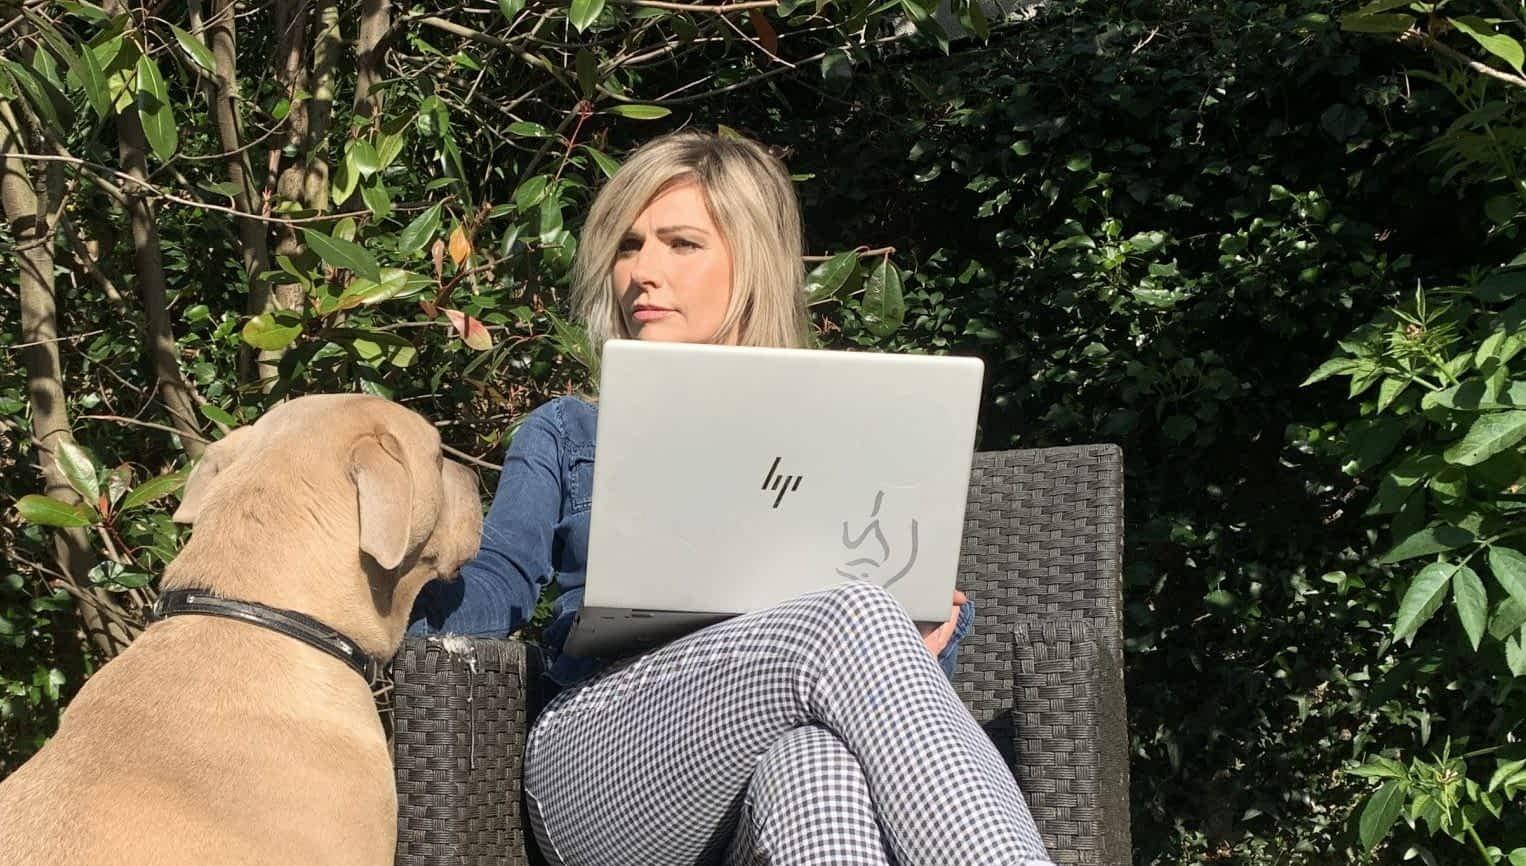 IdeaZilla (Tiffany Quinn) with her rescue dog Clara